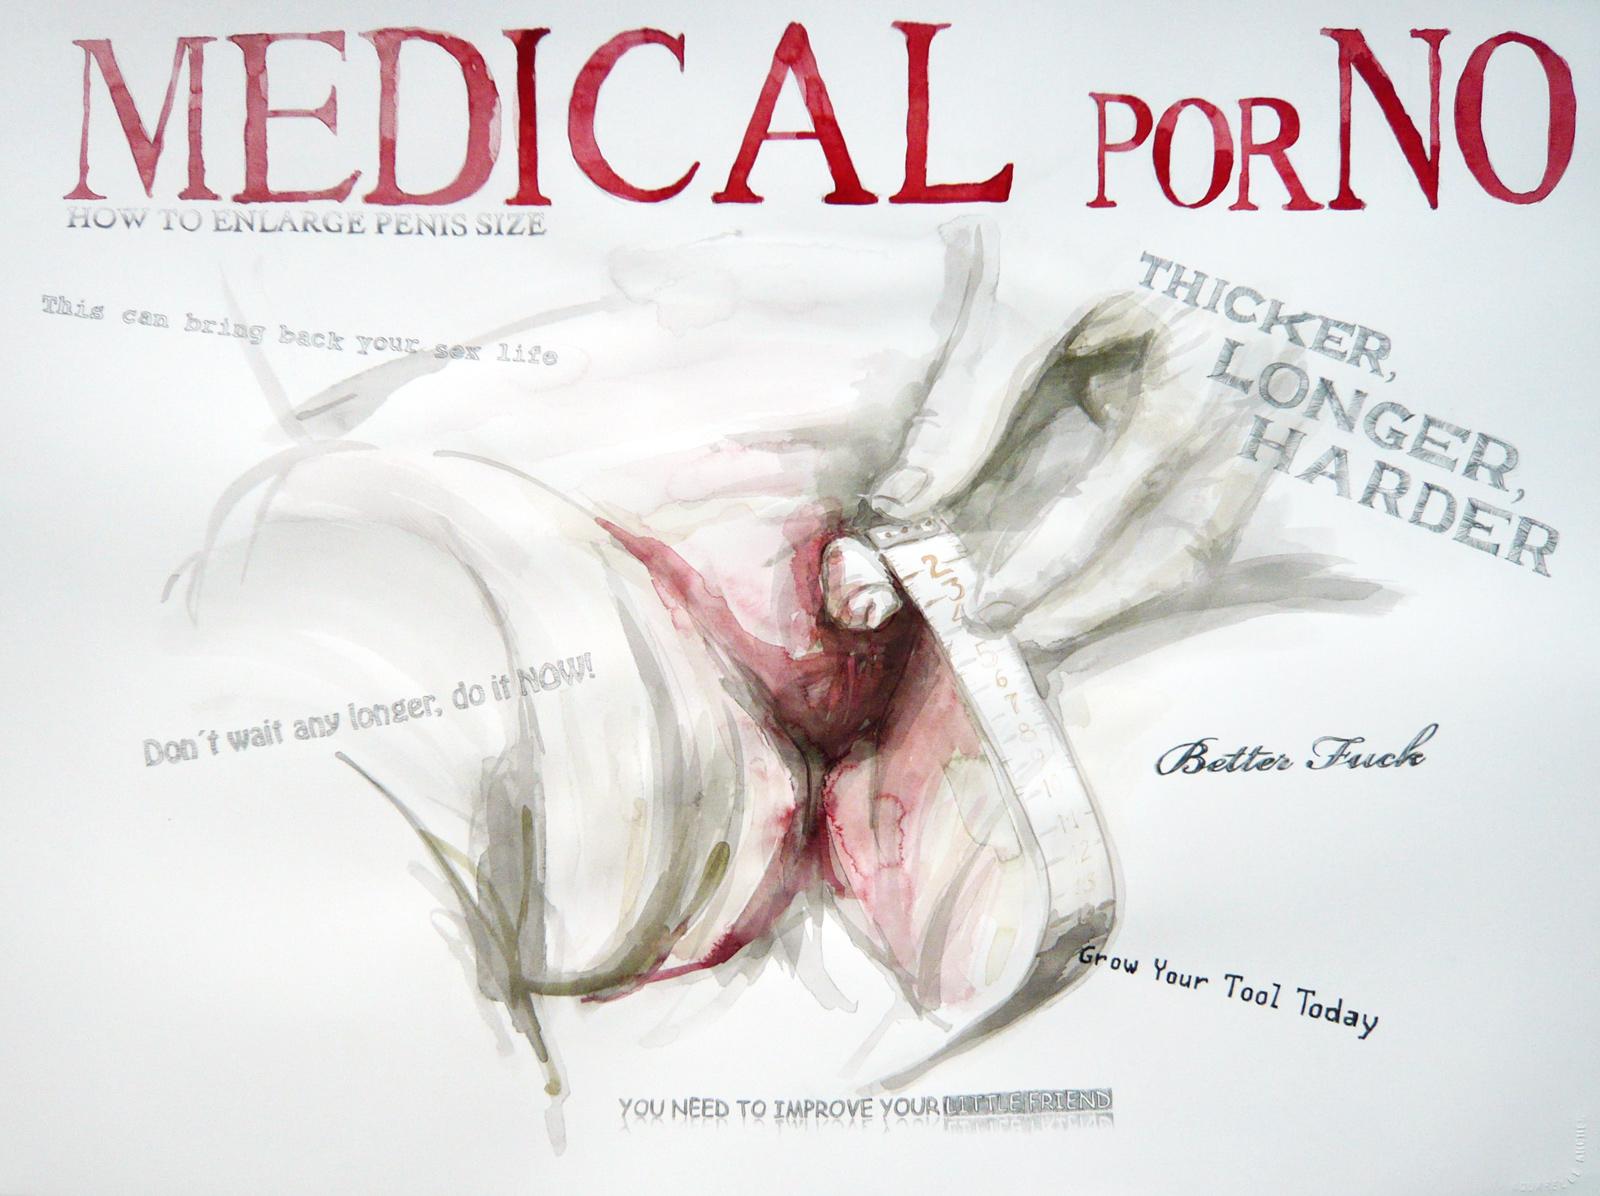 Medical PorNo Vs2